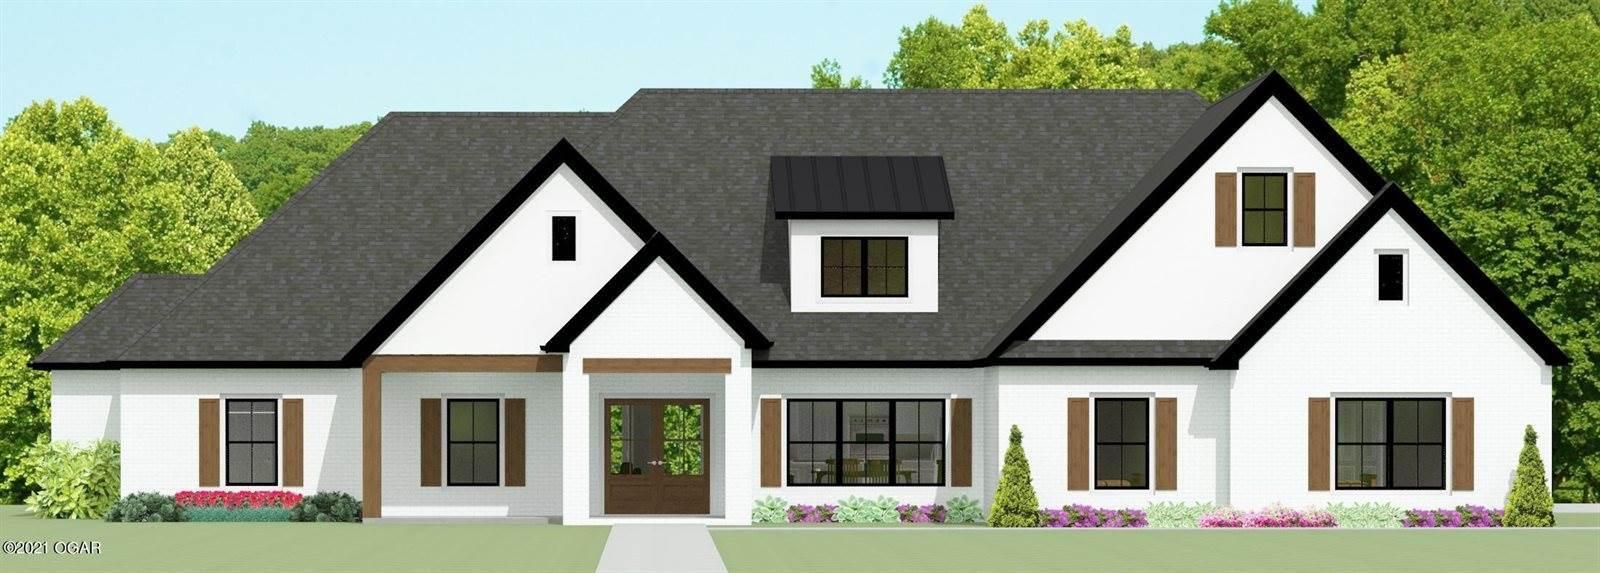 920 North Fountain Street, Carterville, MO 64835